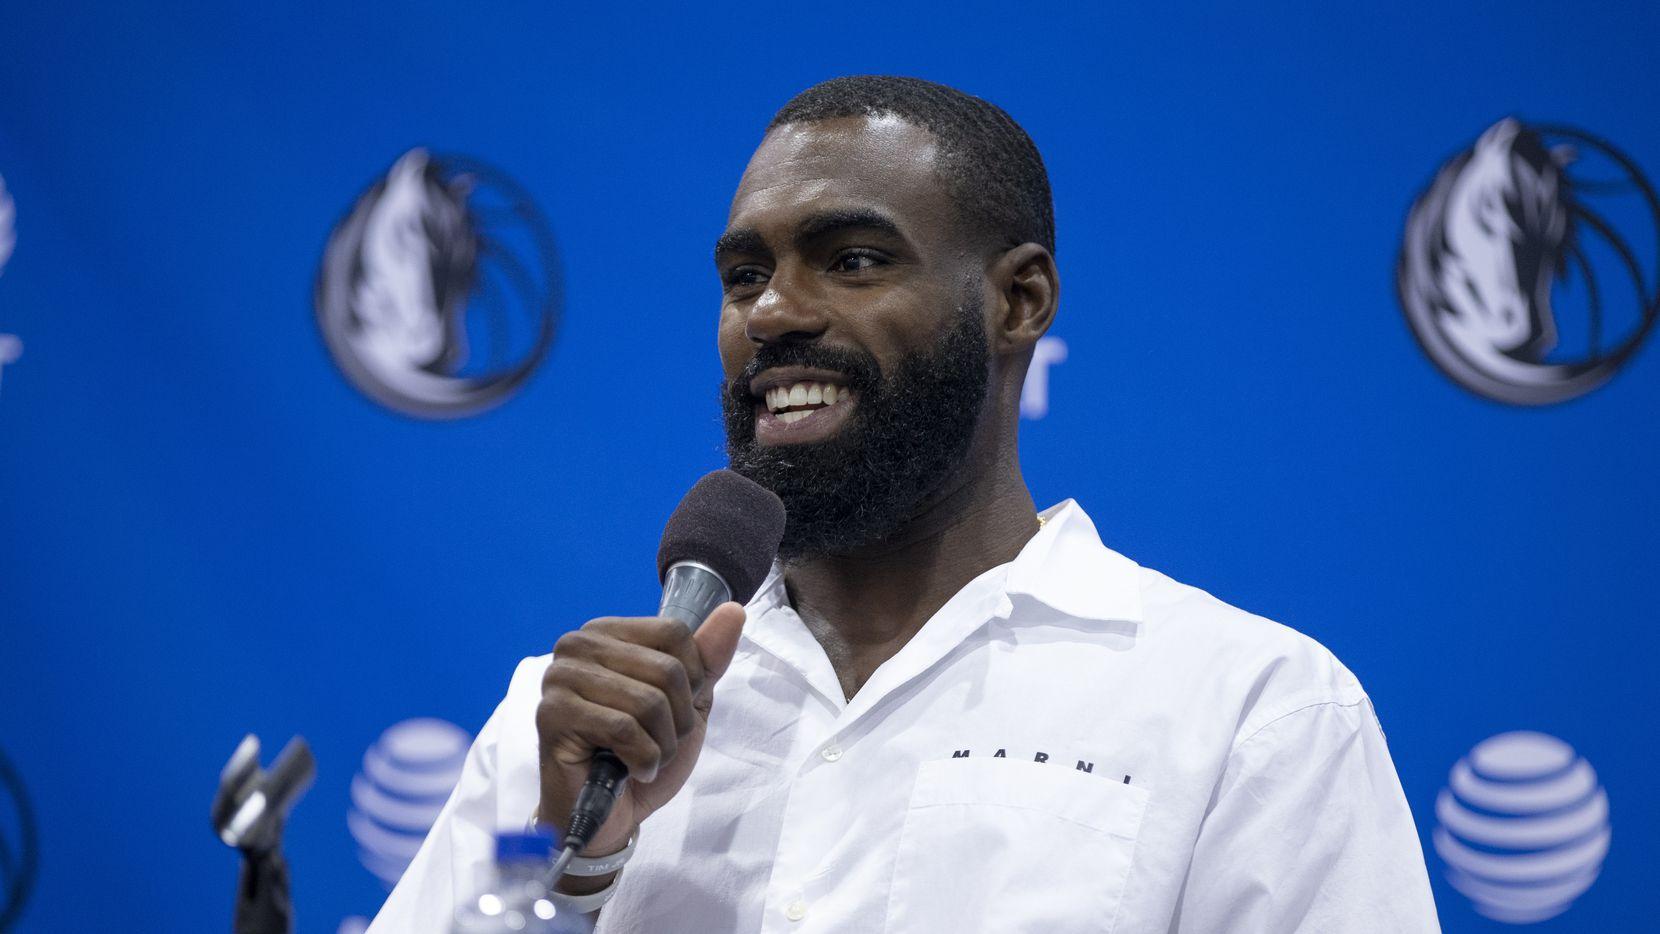 Dallas Mavericks guard Tim Hardaway Jr. speaks during a press conference in Dallas, Friday, August 27, 2021.